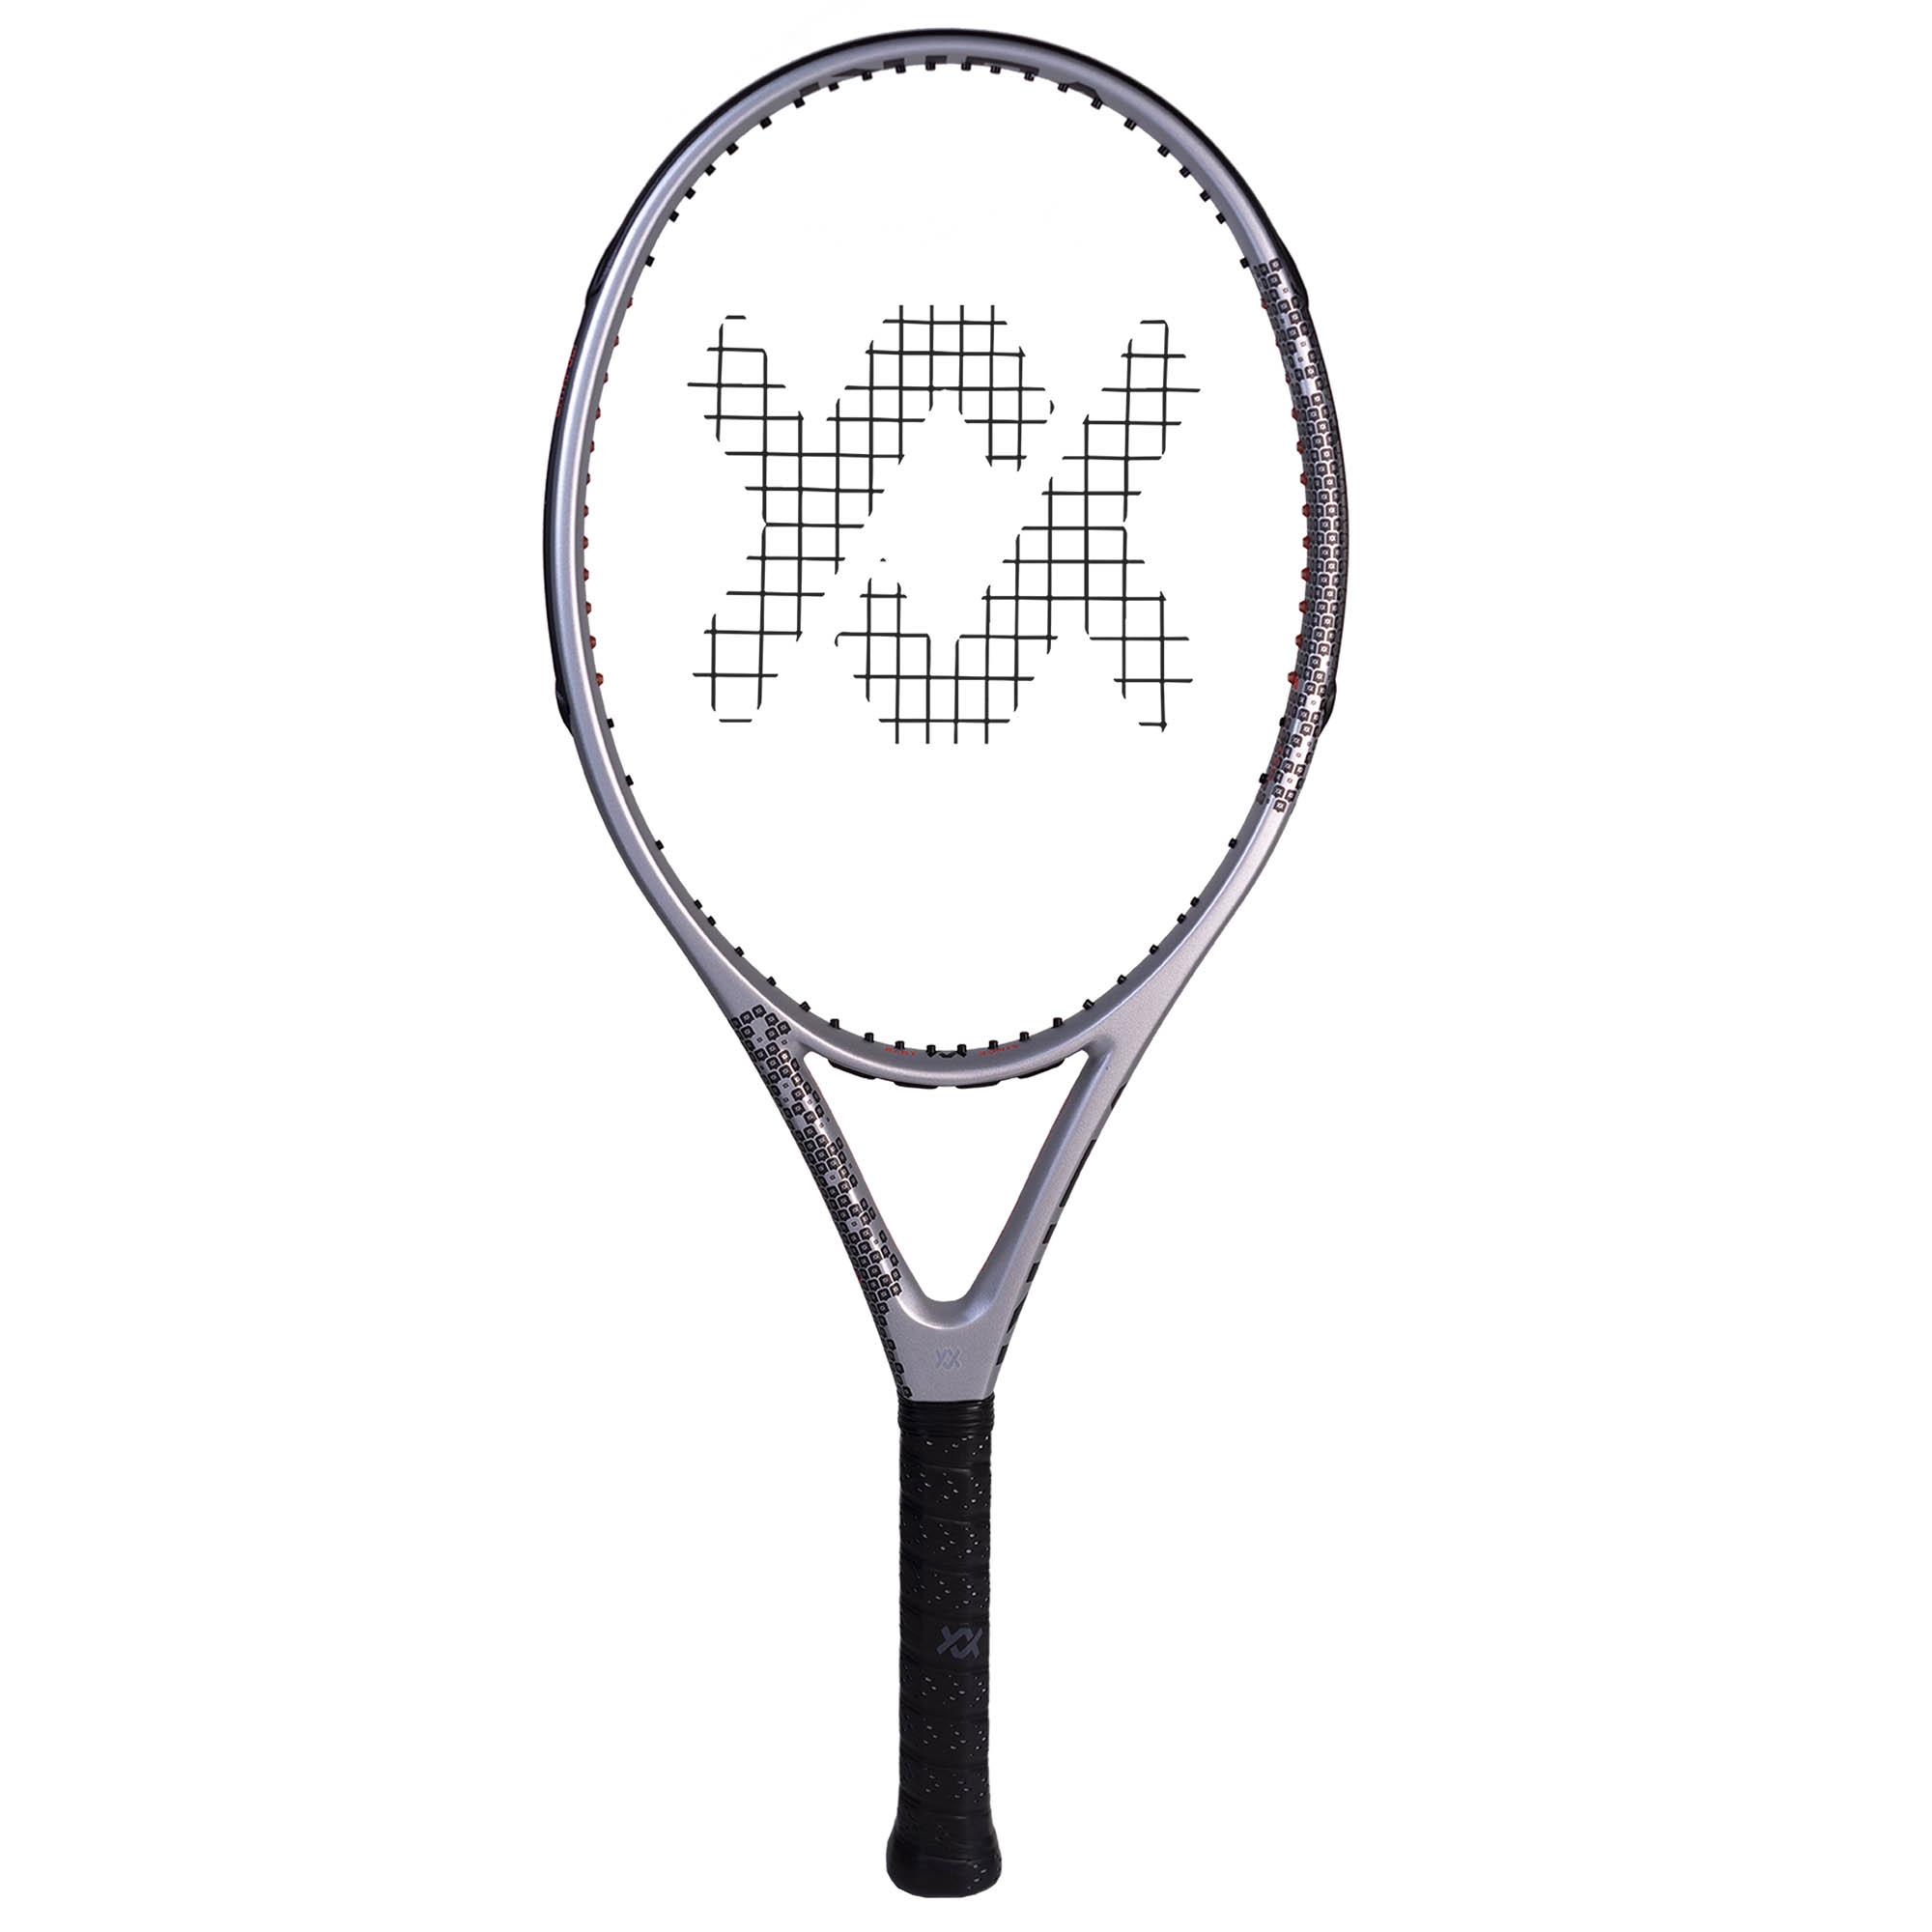 Volkl V-Feel 2 Tennis Racket - Grip 1